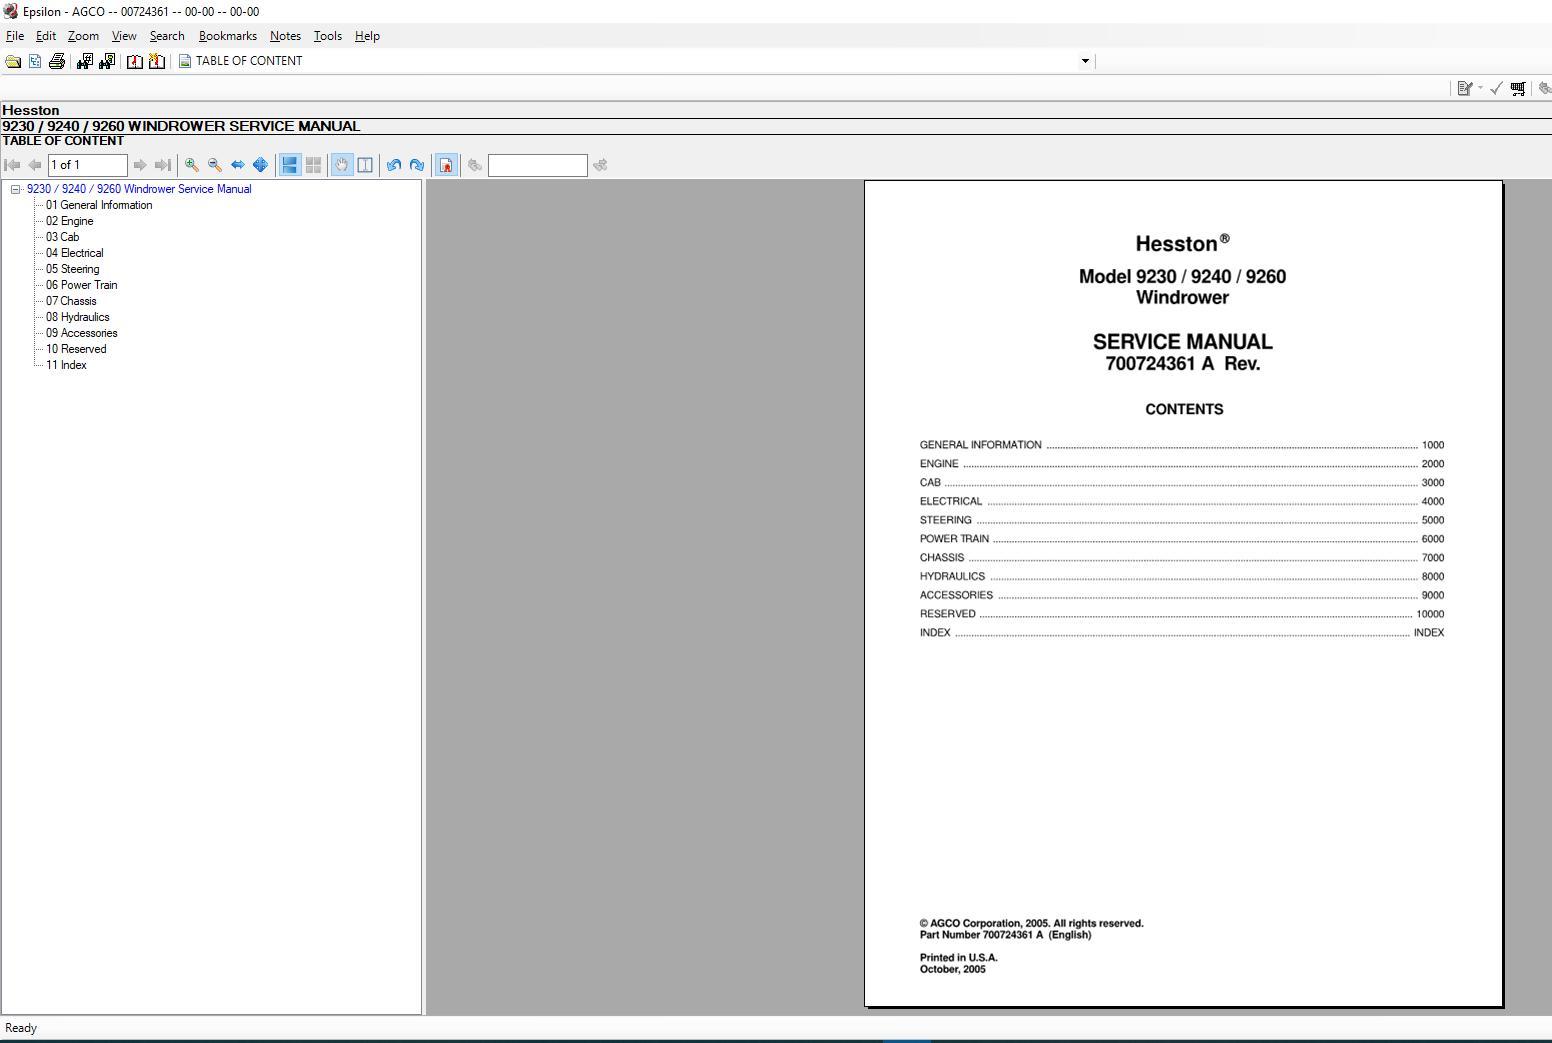 Hesston_AU_AG_052019_Part_Book_Workshop_Service_Manuals5